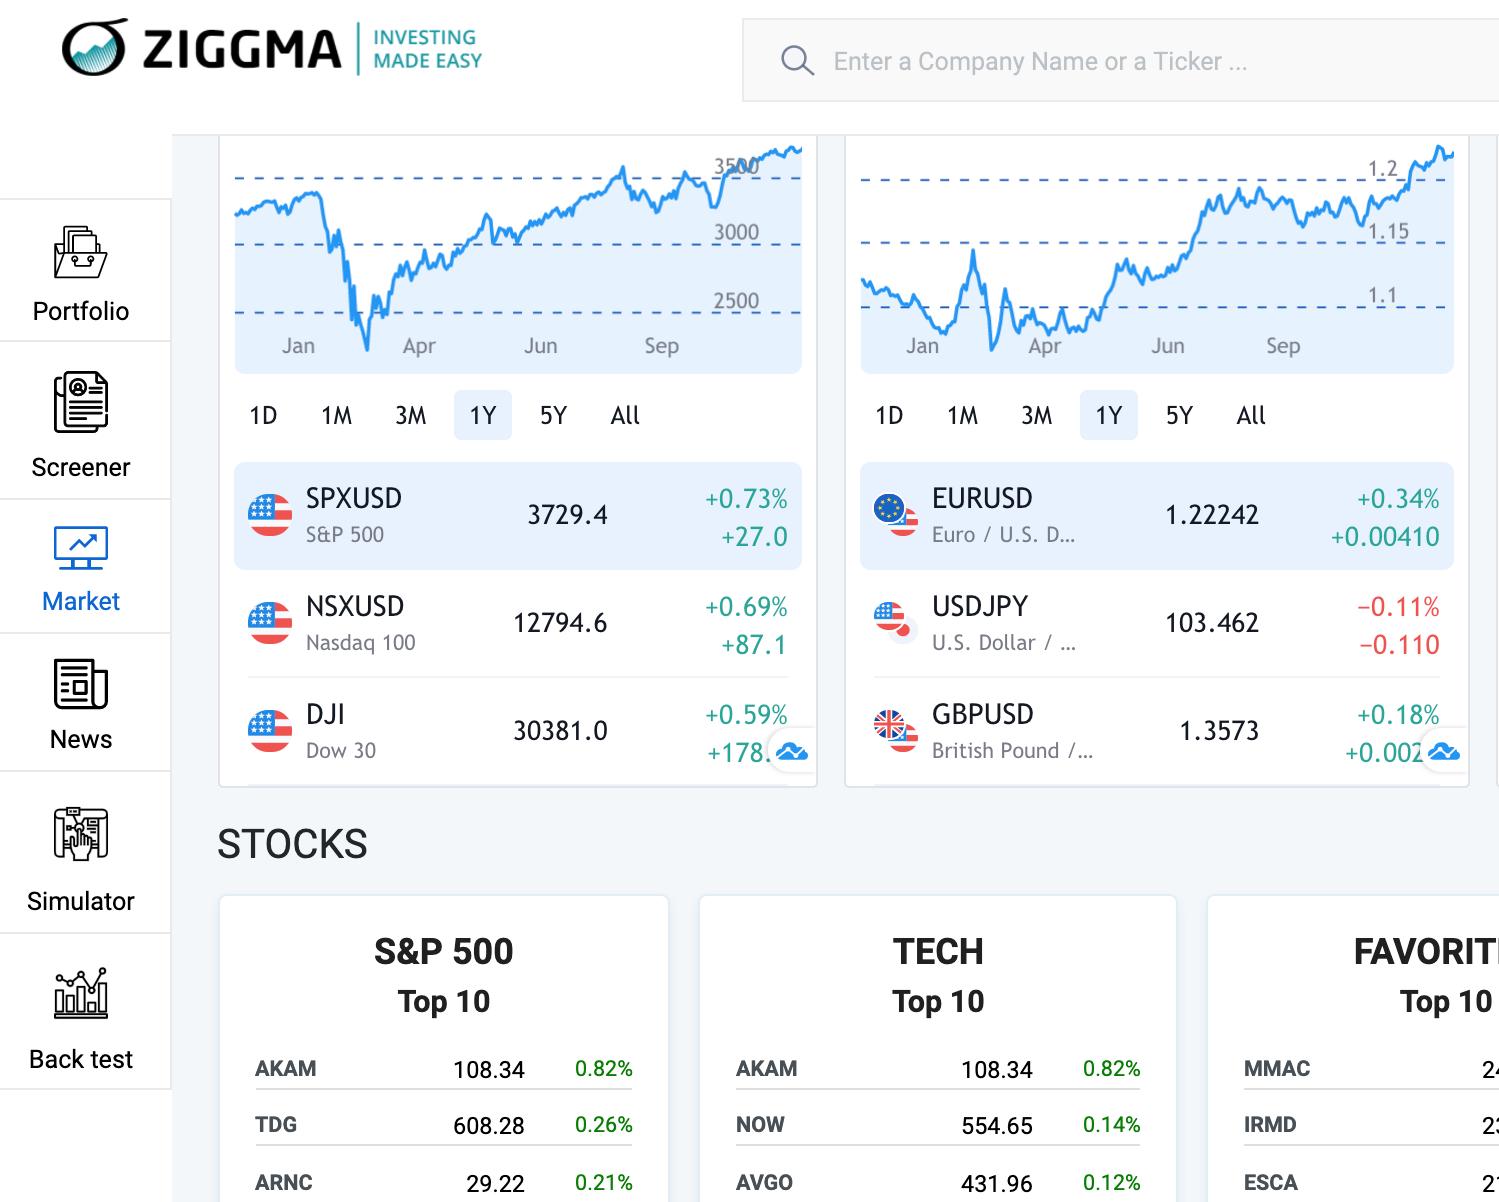 ziggma investing market overview